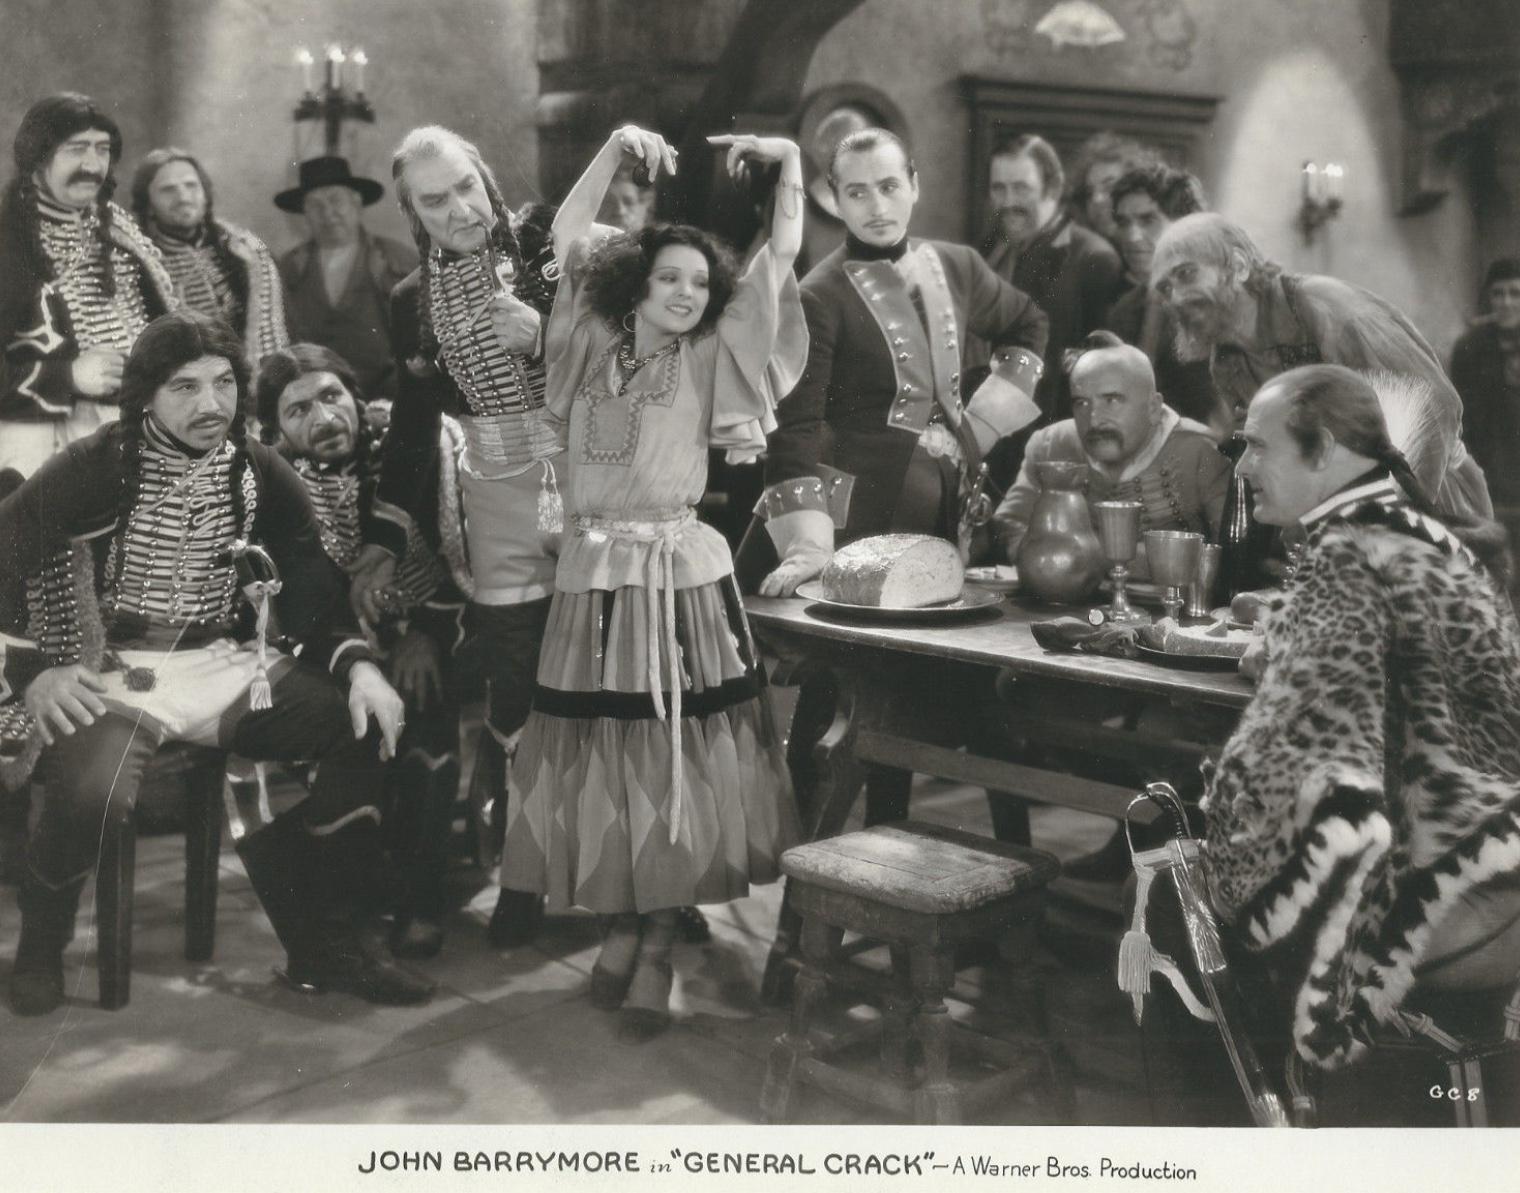 John Barrymore, Armida, Hobart Bosworth, Theodore Lodi, Otto Matieson, Guy Schact, Andrés de Segurola, Lowell Sherman, Nick Thompson, and Wilhelm von Brincken in General Crack (1929)